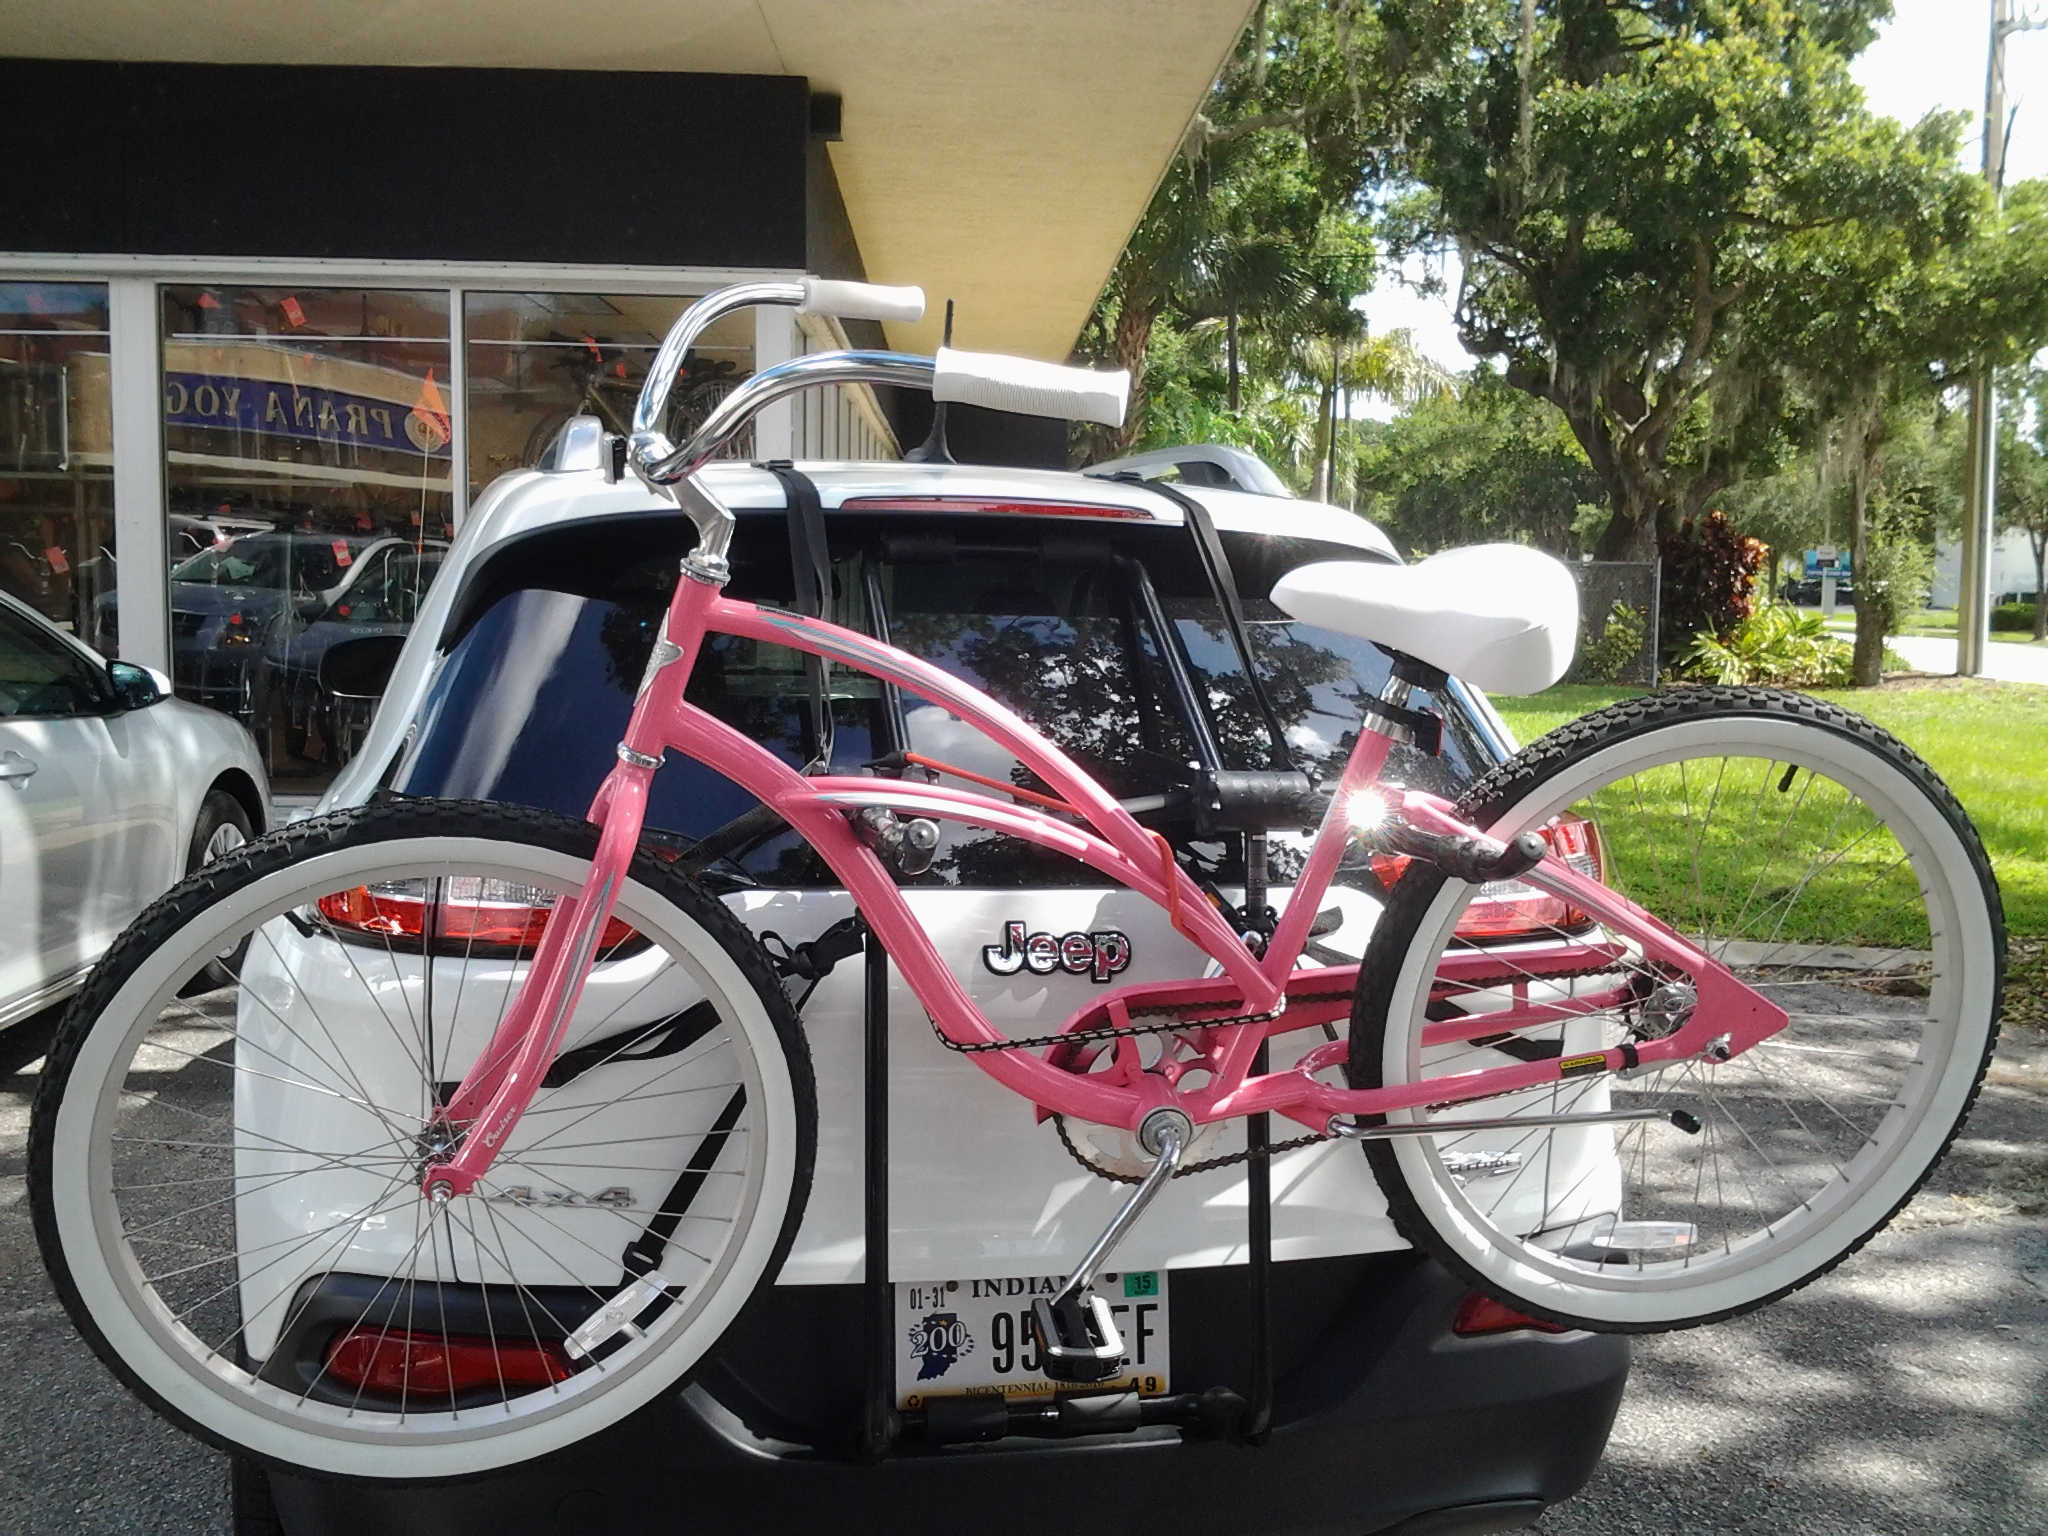 beach cruiser bike rack for car off 75 www daralnahda com